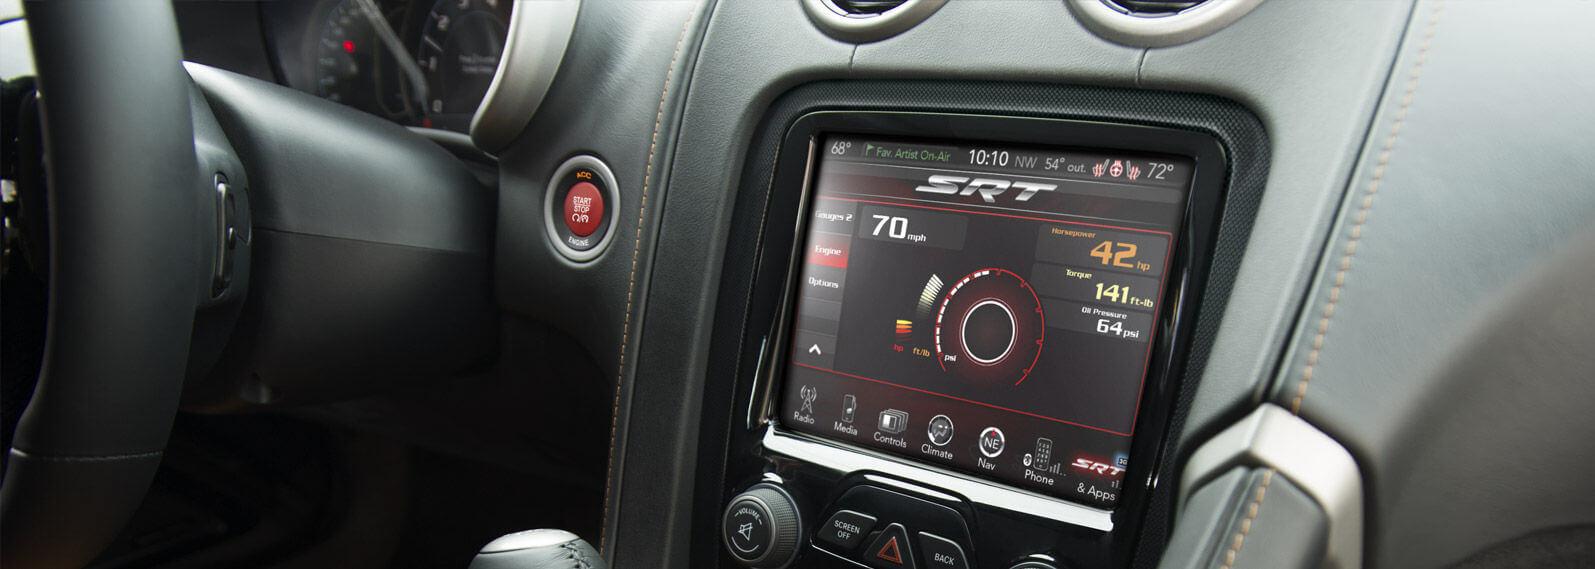 2016 Dodge Viper touchscreen